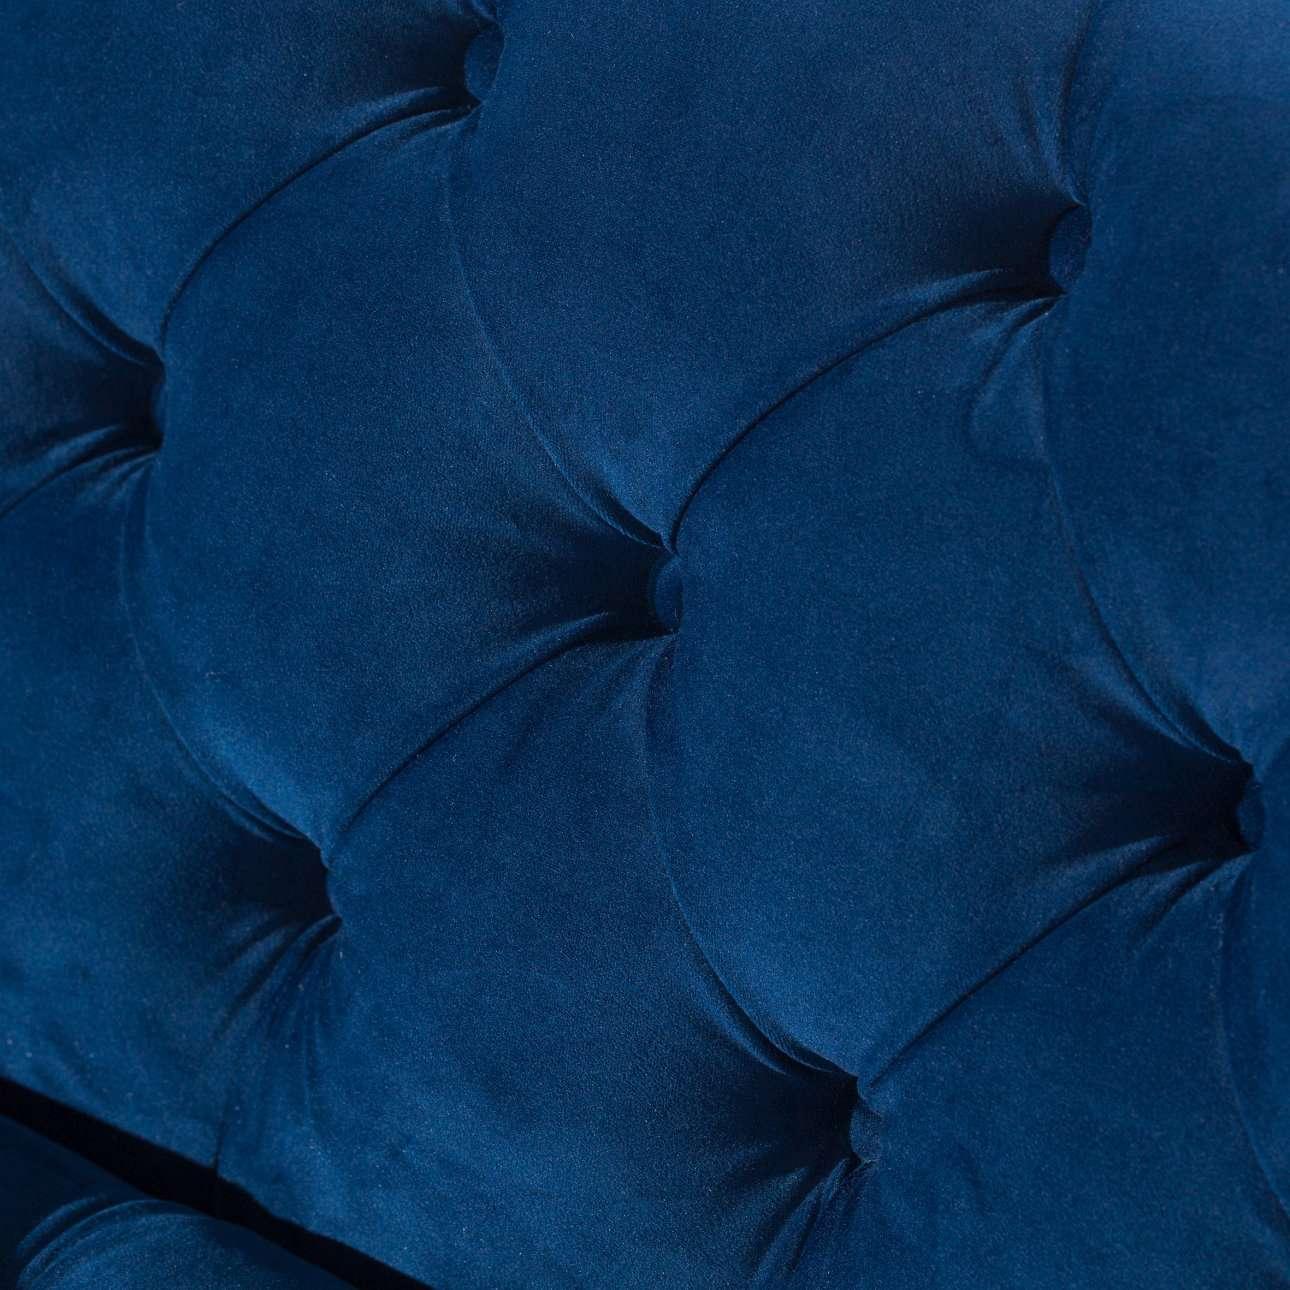 Sofa Velvet Elite indigo blue 3-os.